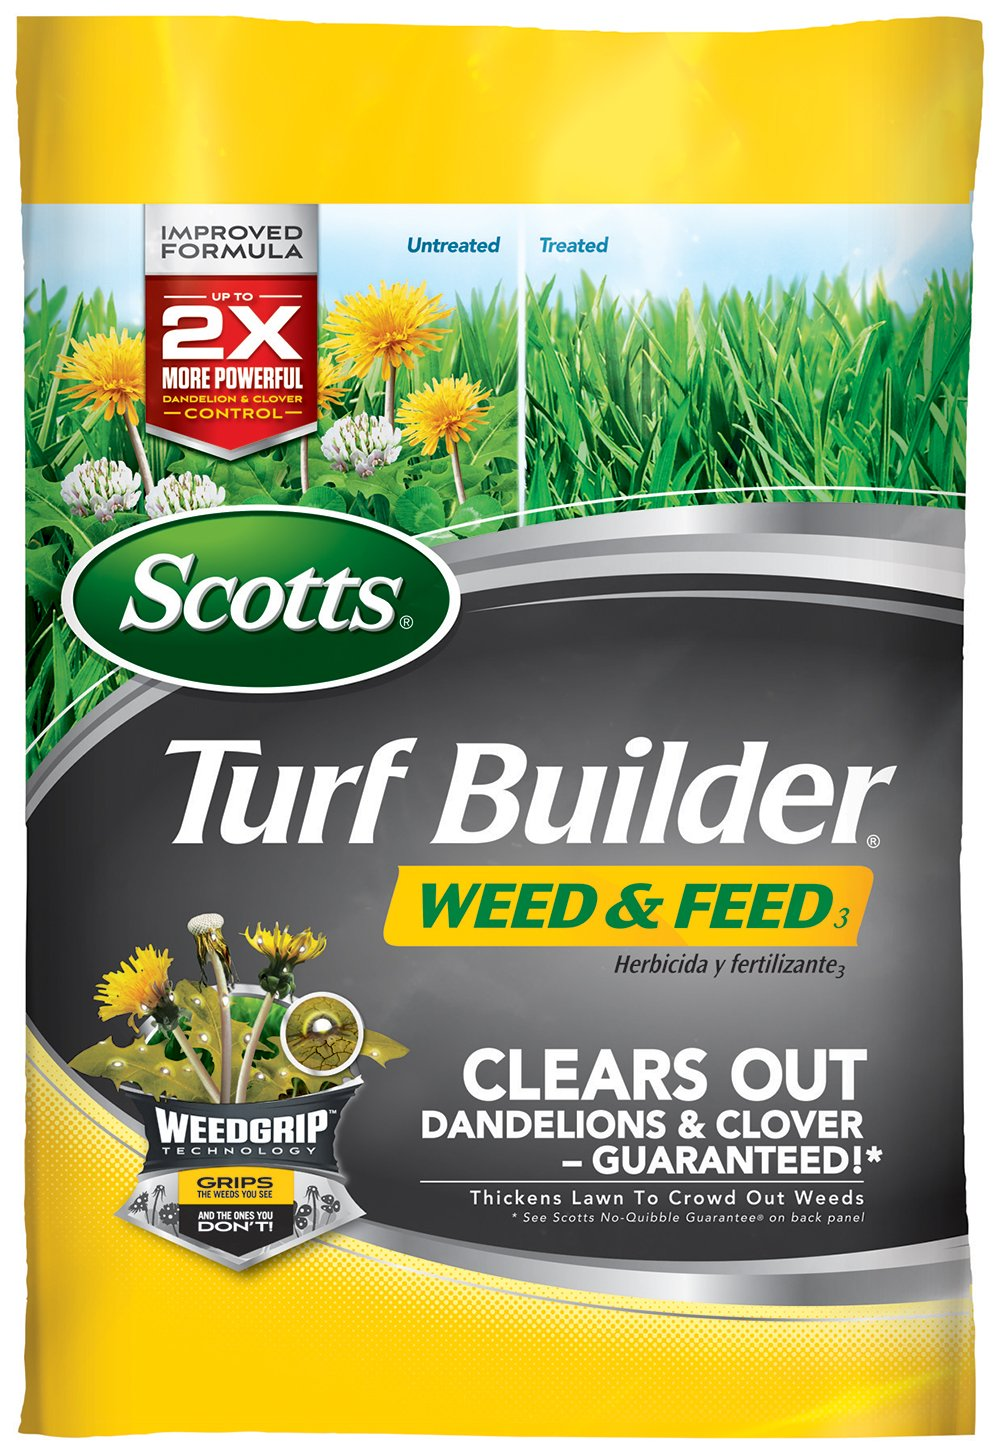 Scotts 25012 Turf Builder Weed & Feed Fertilizer (4 Pack)